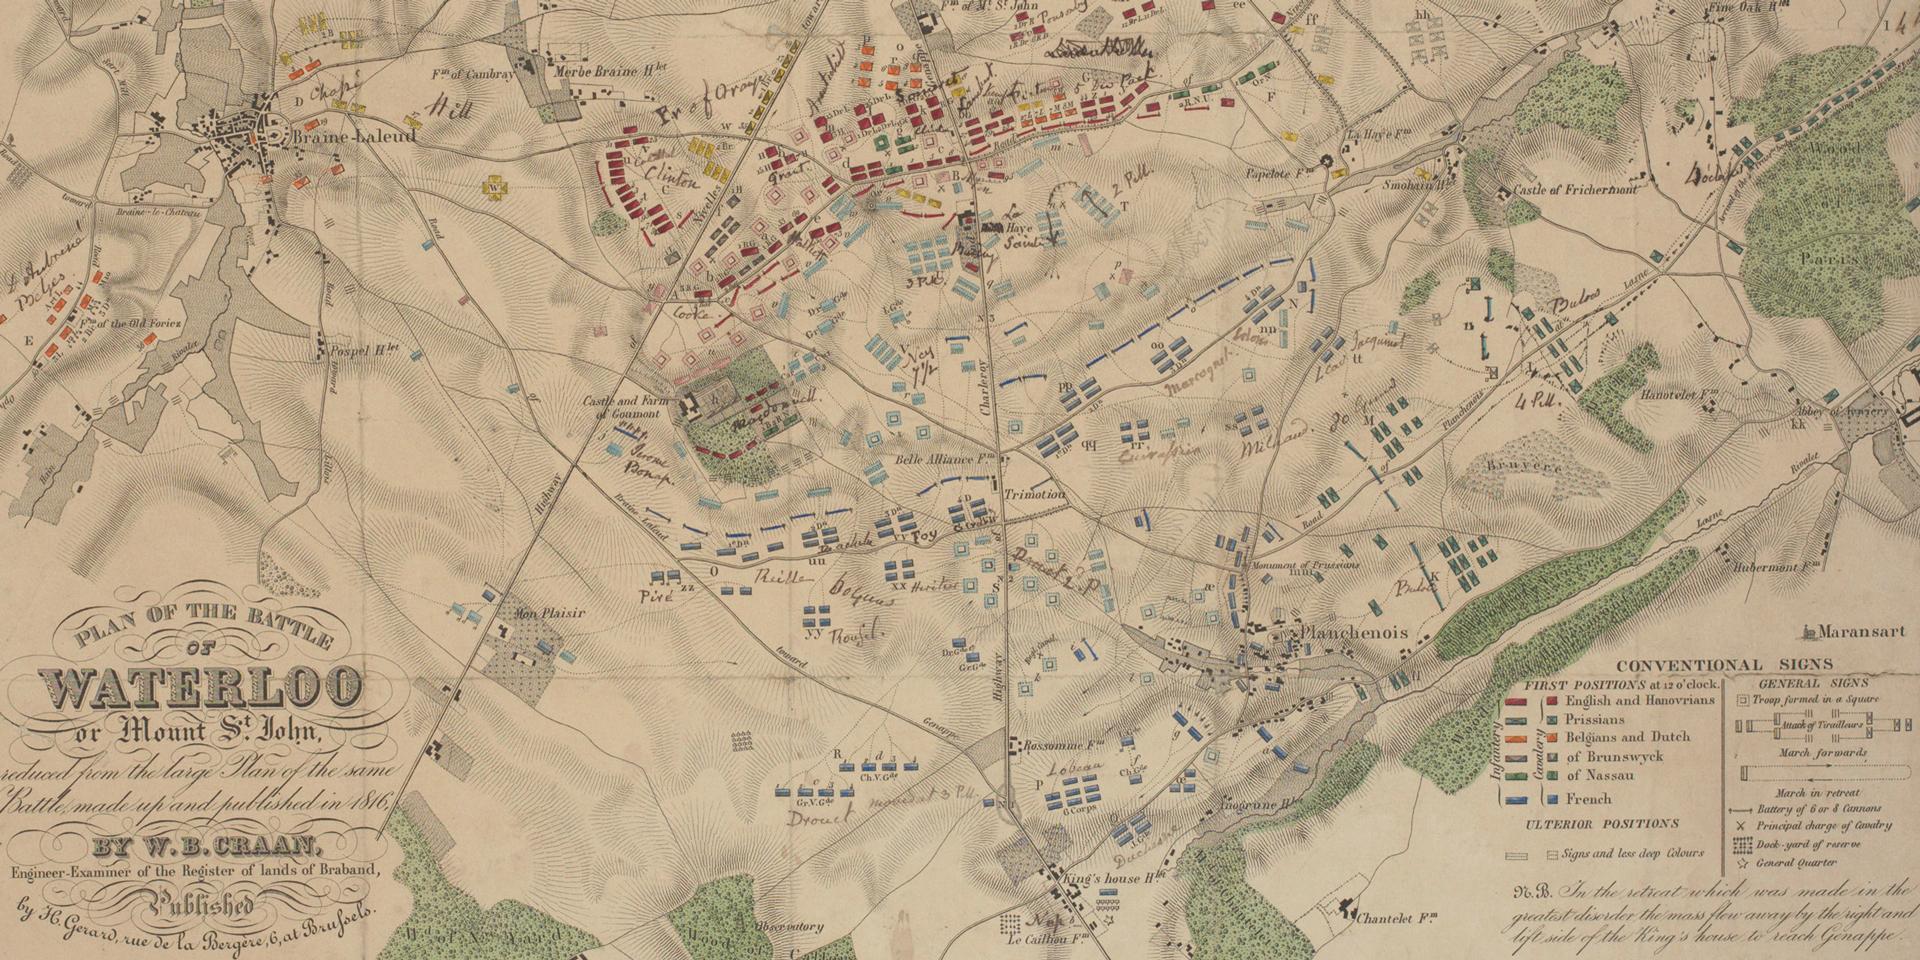 Plan of the Battle of Waterloo, 1816